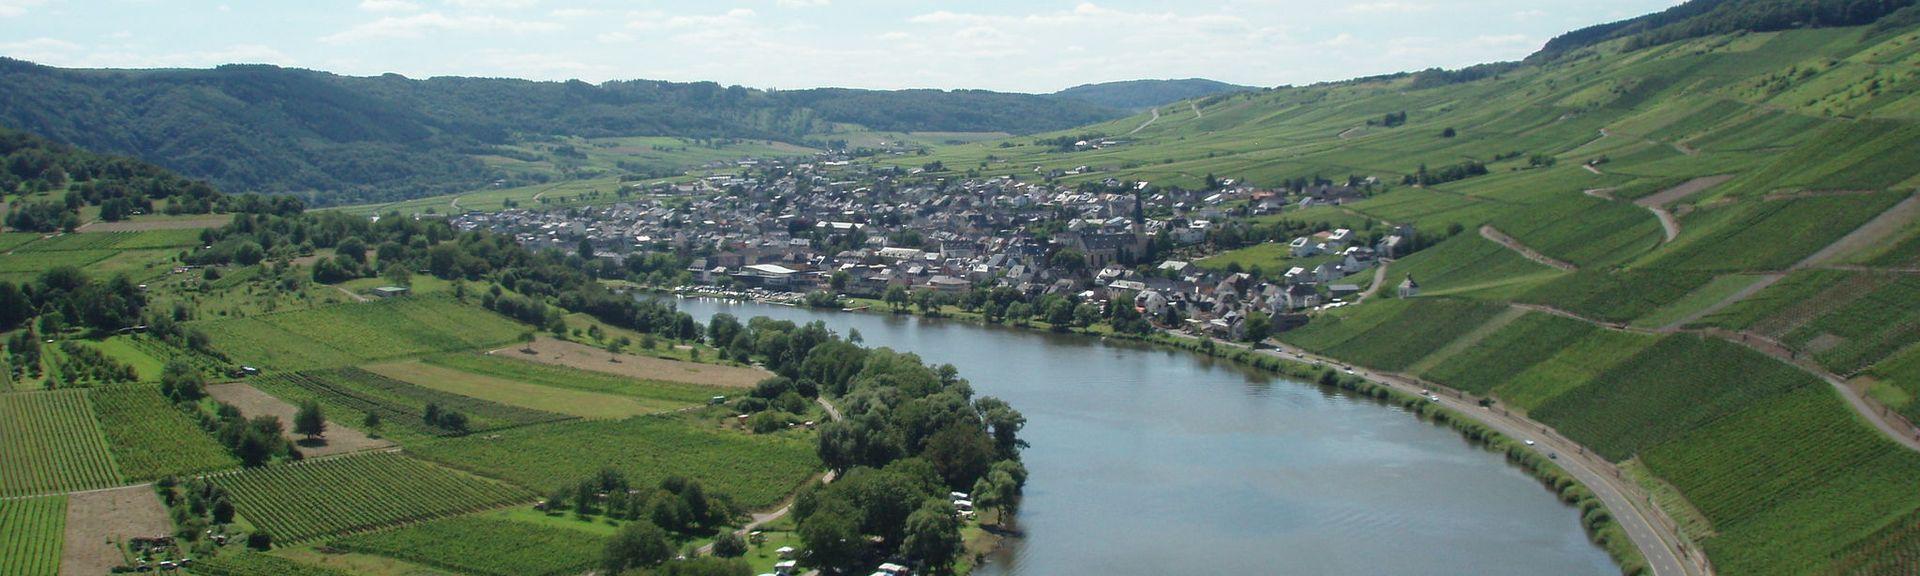 Leiwen, Germany